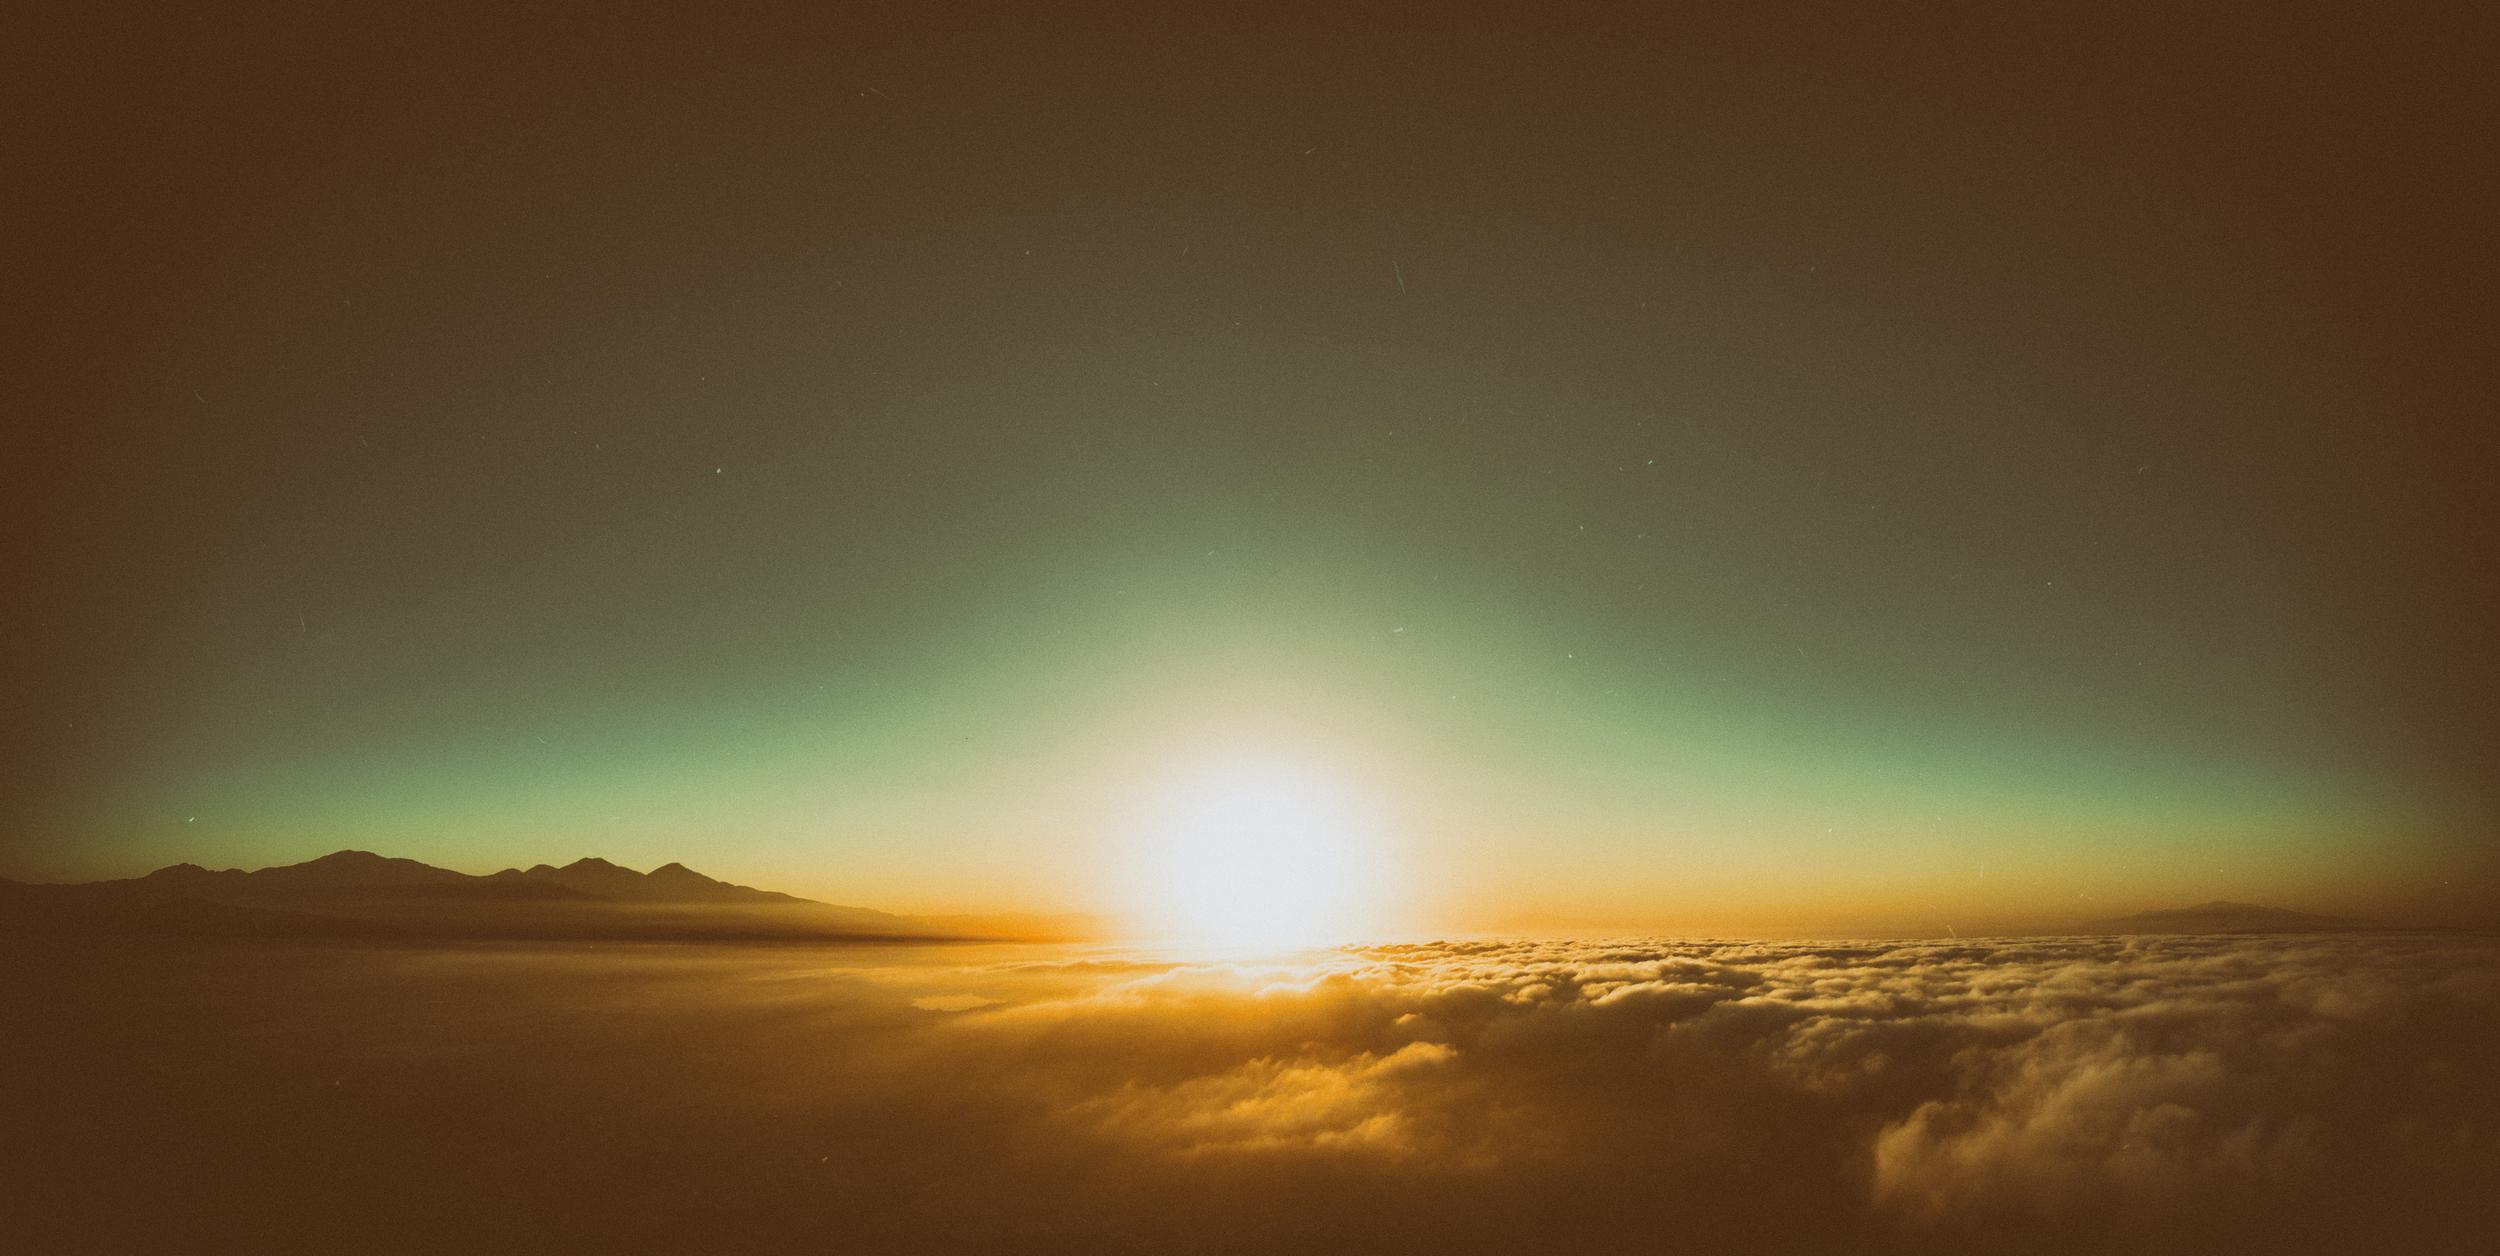 Sunset Image 1